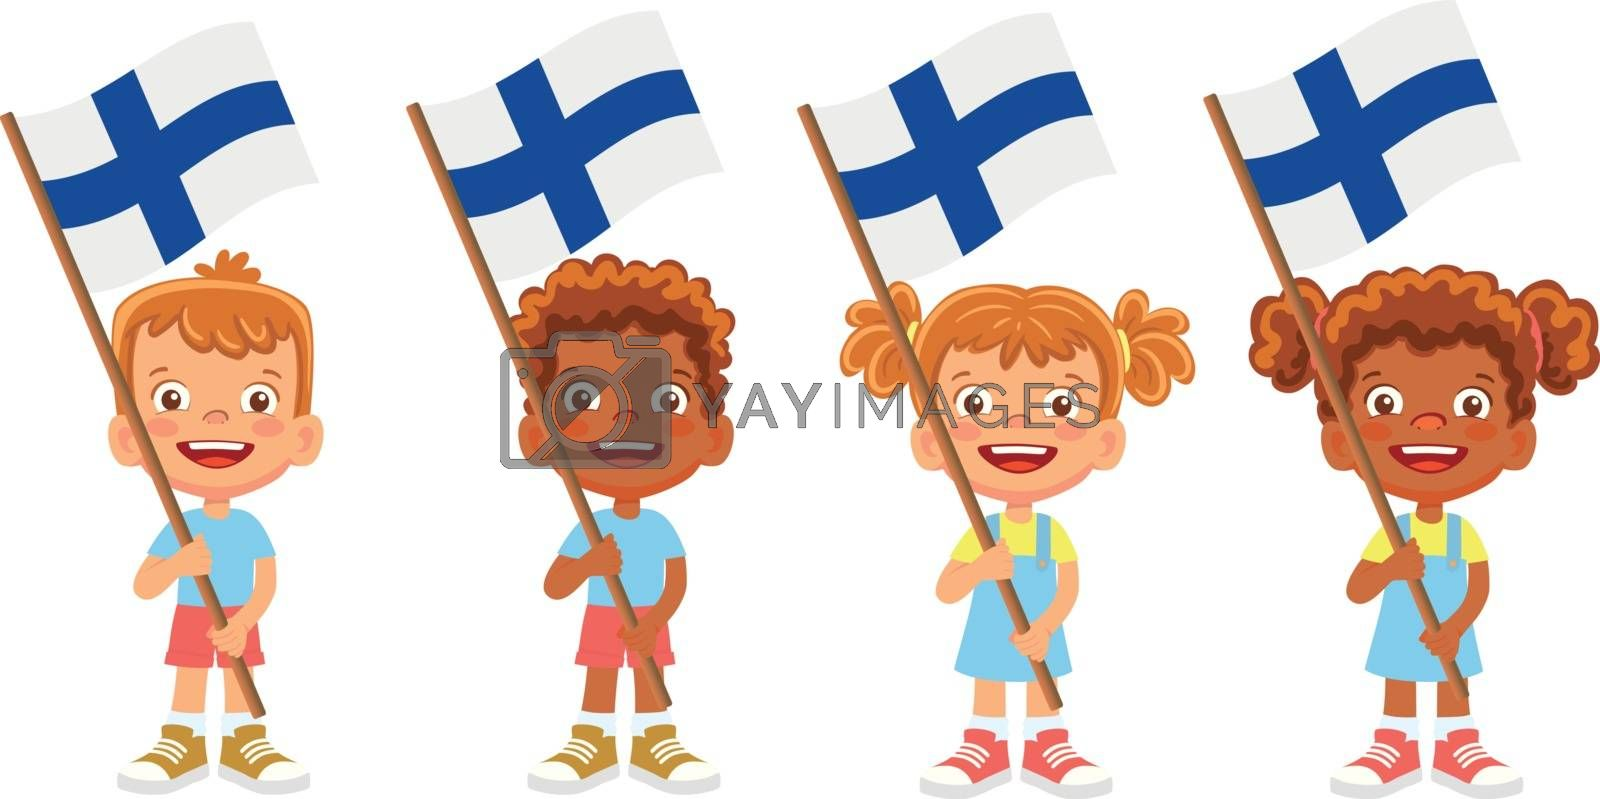 Finland flag in hand. Children holding flag. National flag of Finland vector